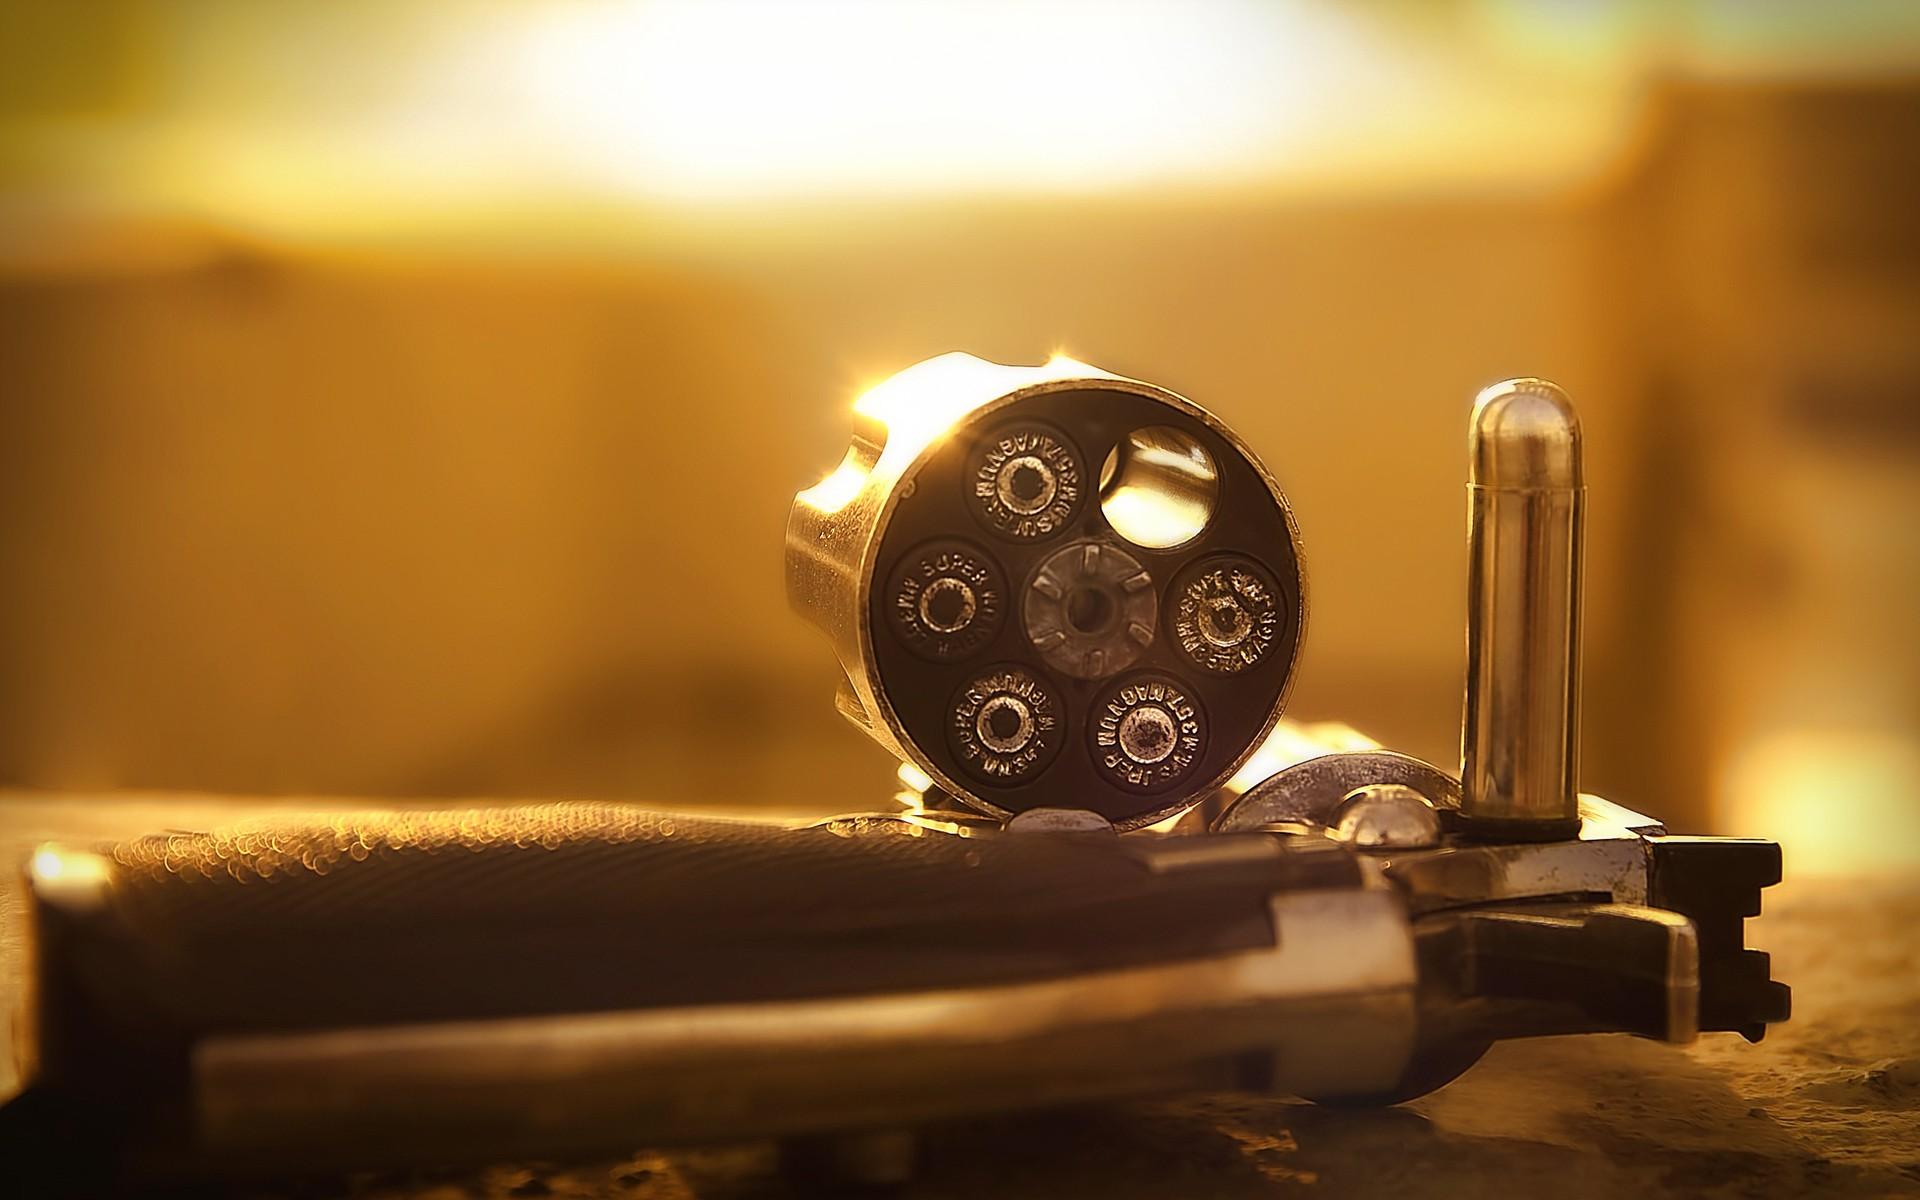 pistols guns revolvers ammunition Colt wallpaper background 1920x1200